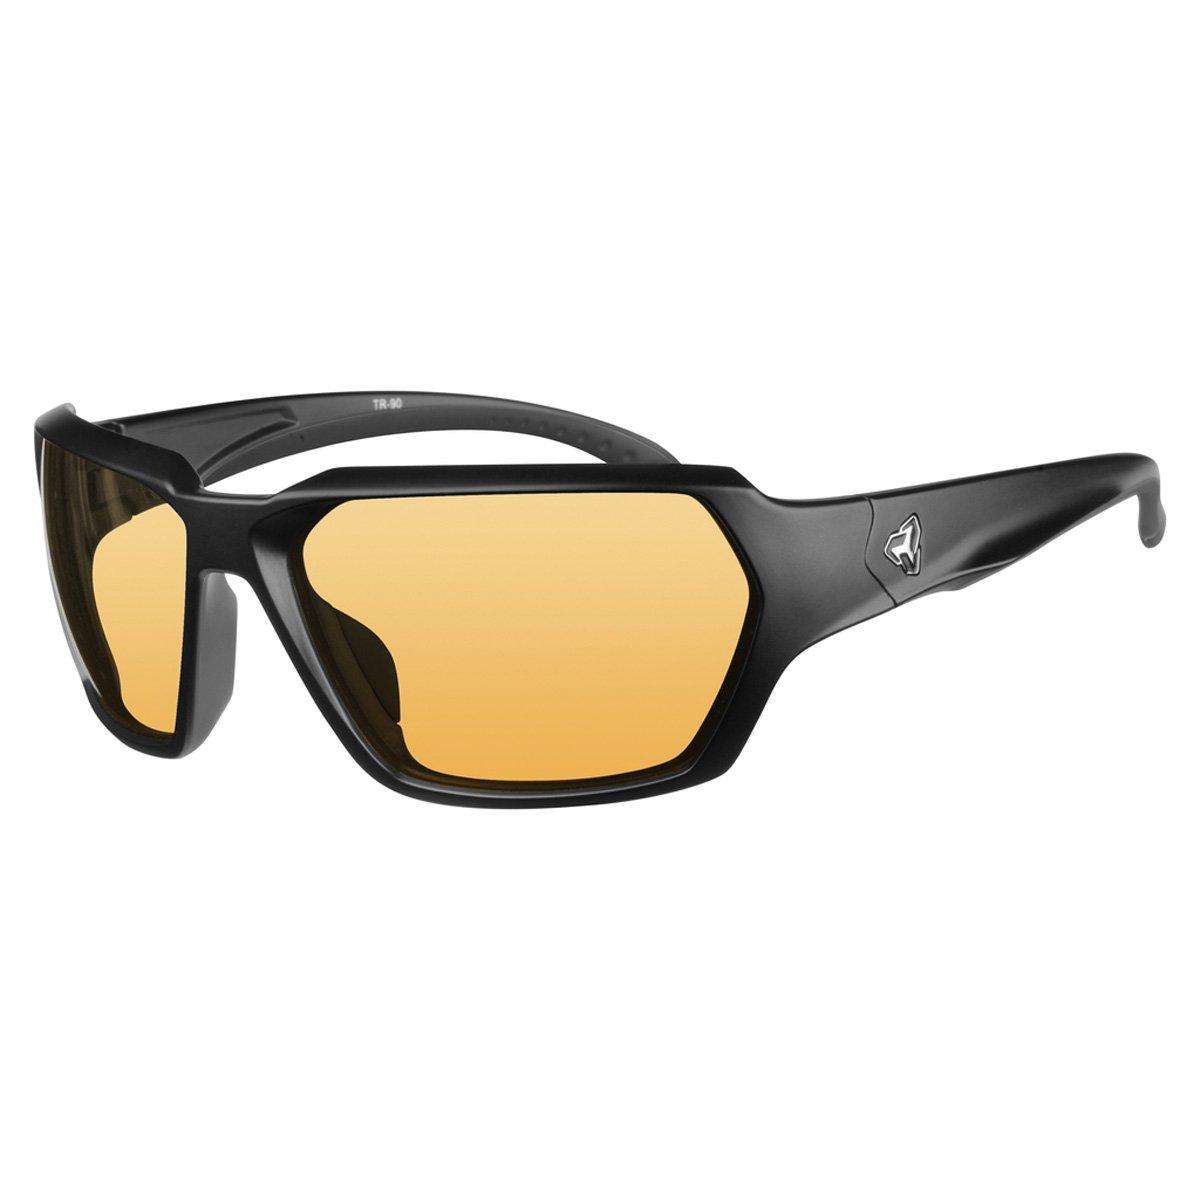 c4c136f60c8 Amazon.com  Ryders Face R448-001 Wrap Sunglasses